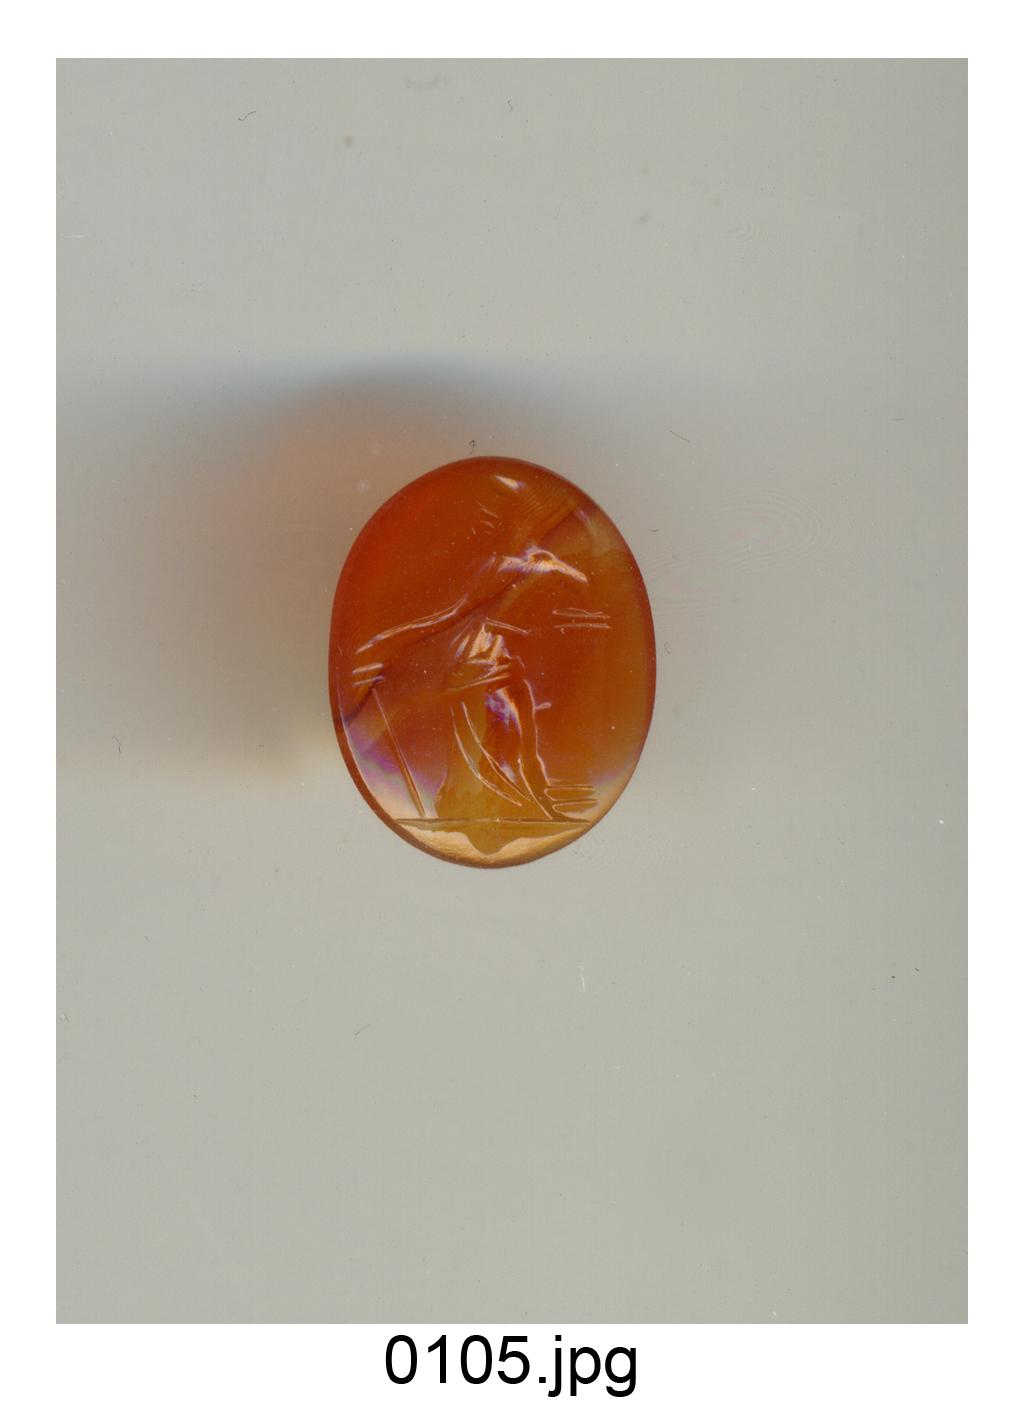 figura maschile (gemma) - produzione italiana (secc. XVI/ XVIII)